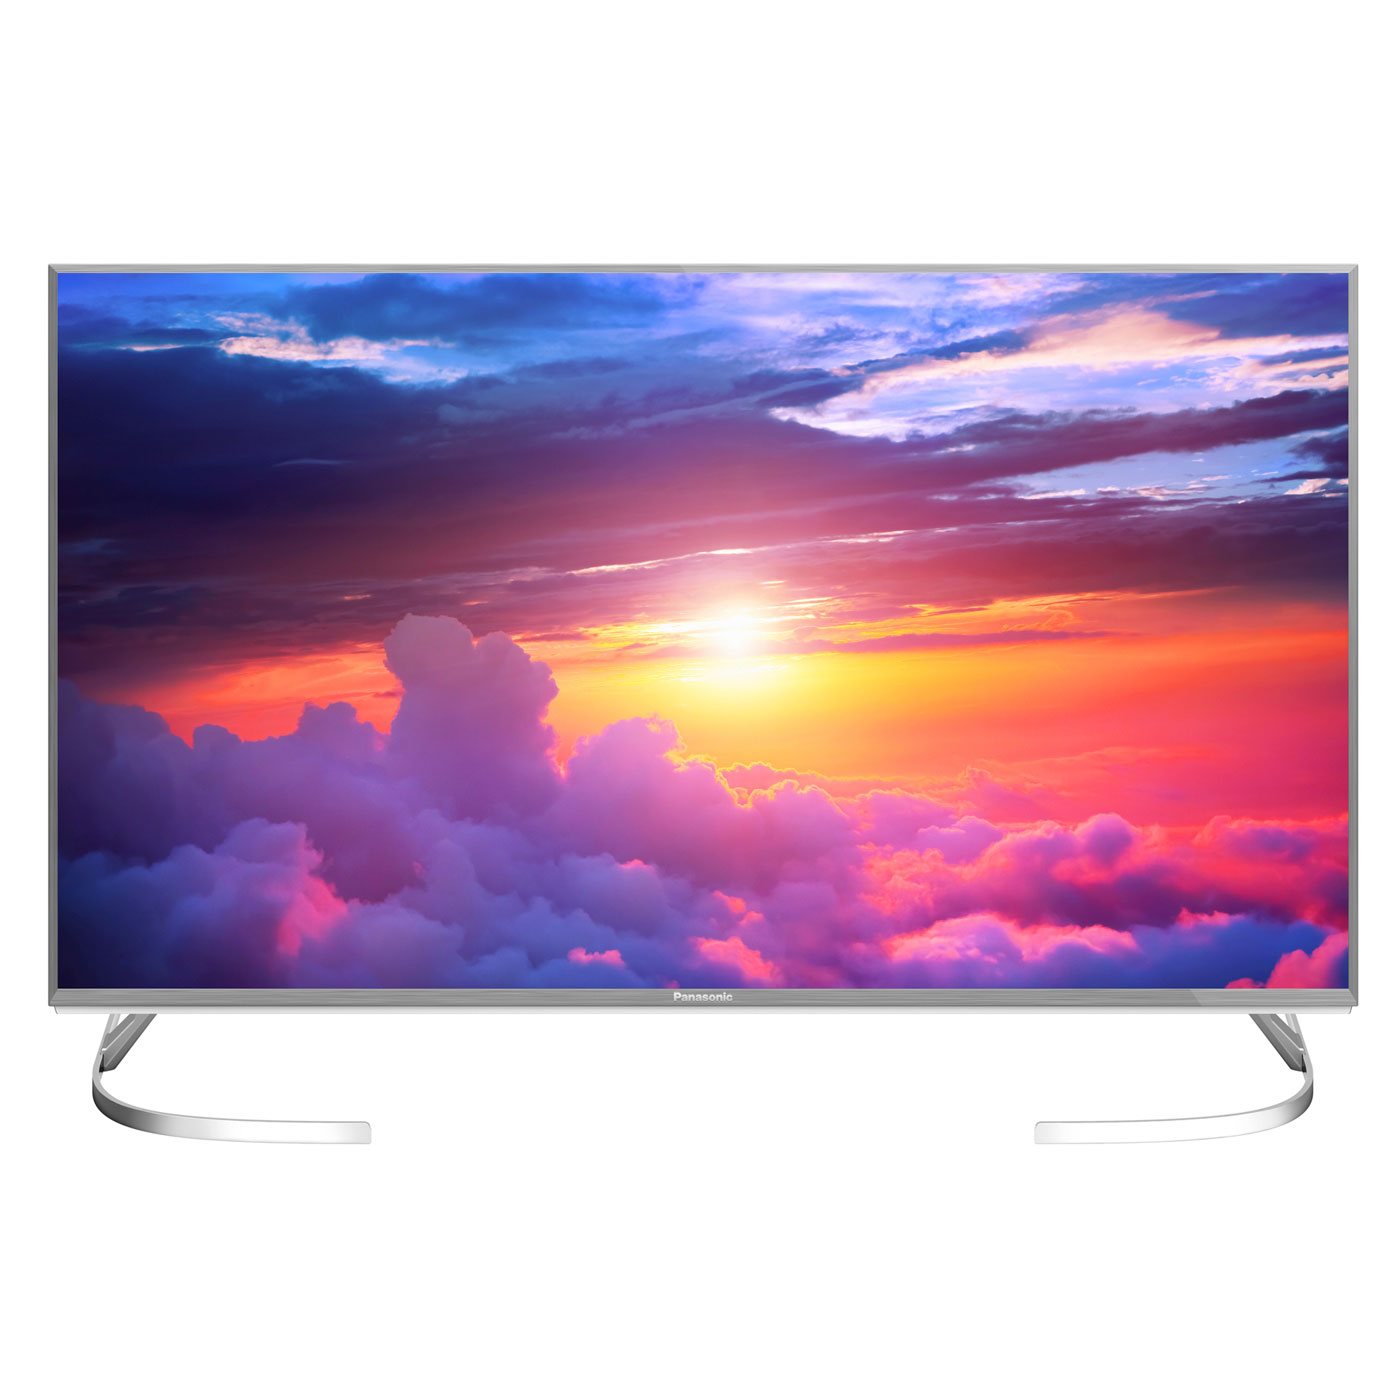 "TV Panasonic TX-58EX700E Téléviseur LED 4K 58"" (147 cm) 16/9 - 3840 x 2160 pixels - TNT et Câble HD - Ultra HD - HDR - 1600 Hz - Wi-Fi - DLNA"